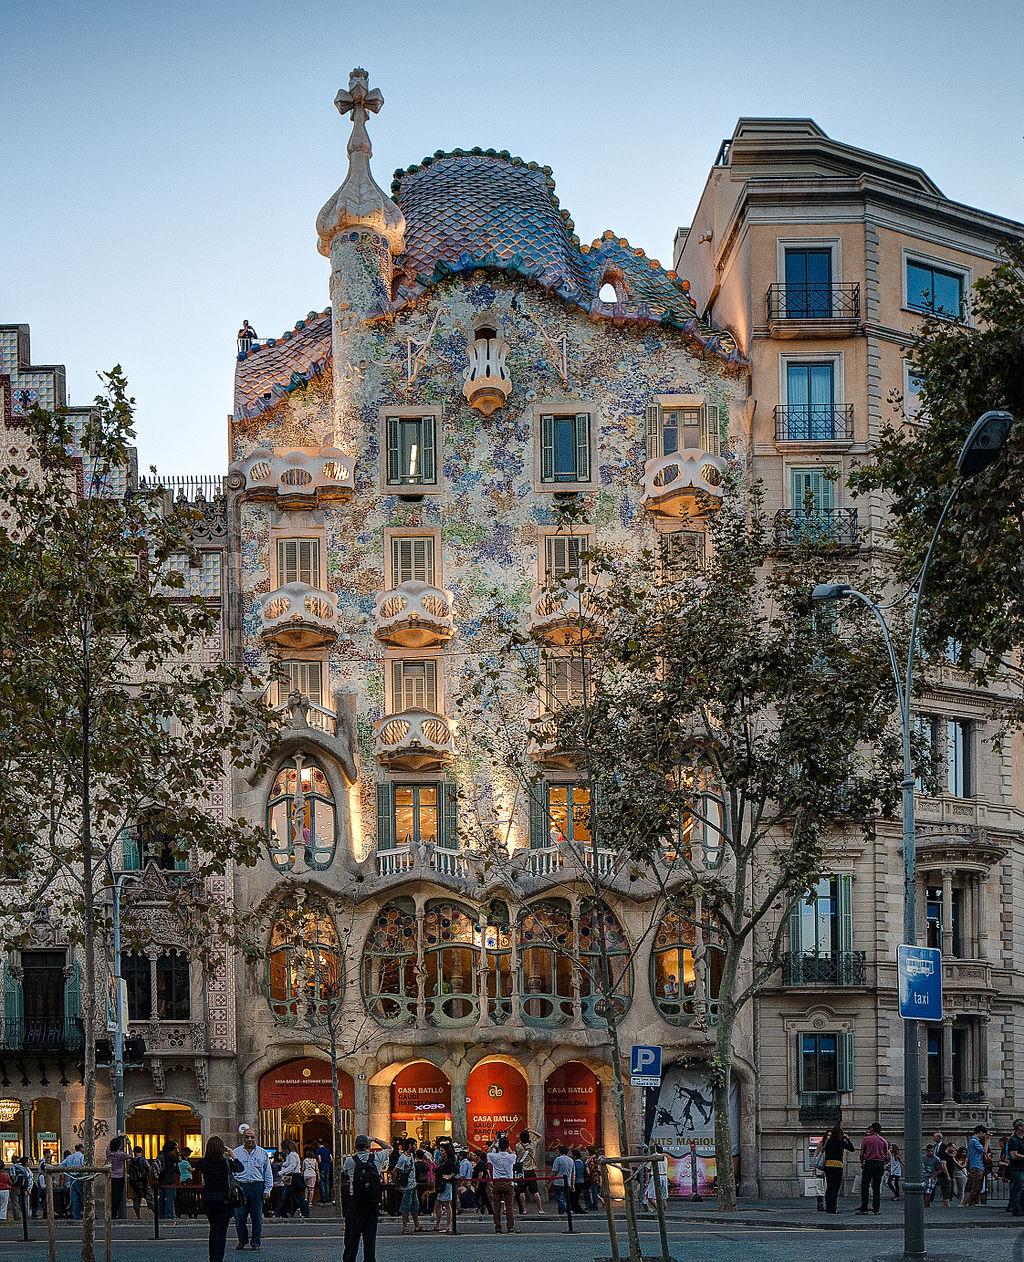 Barcelona Spain: Casa Batlló, Barcelona: Restoration Project Open House